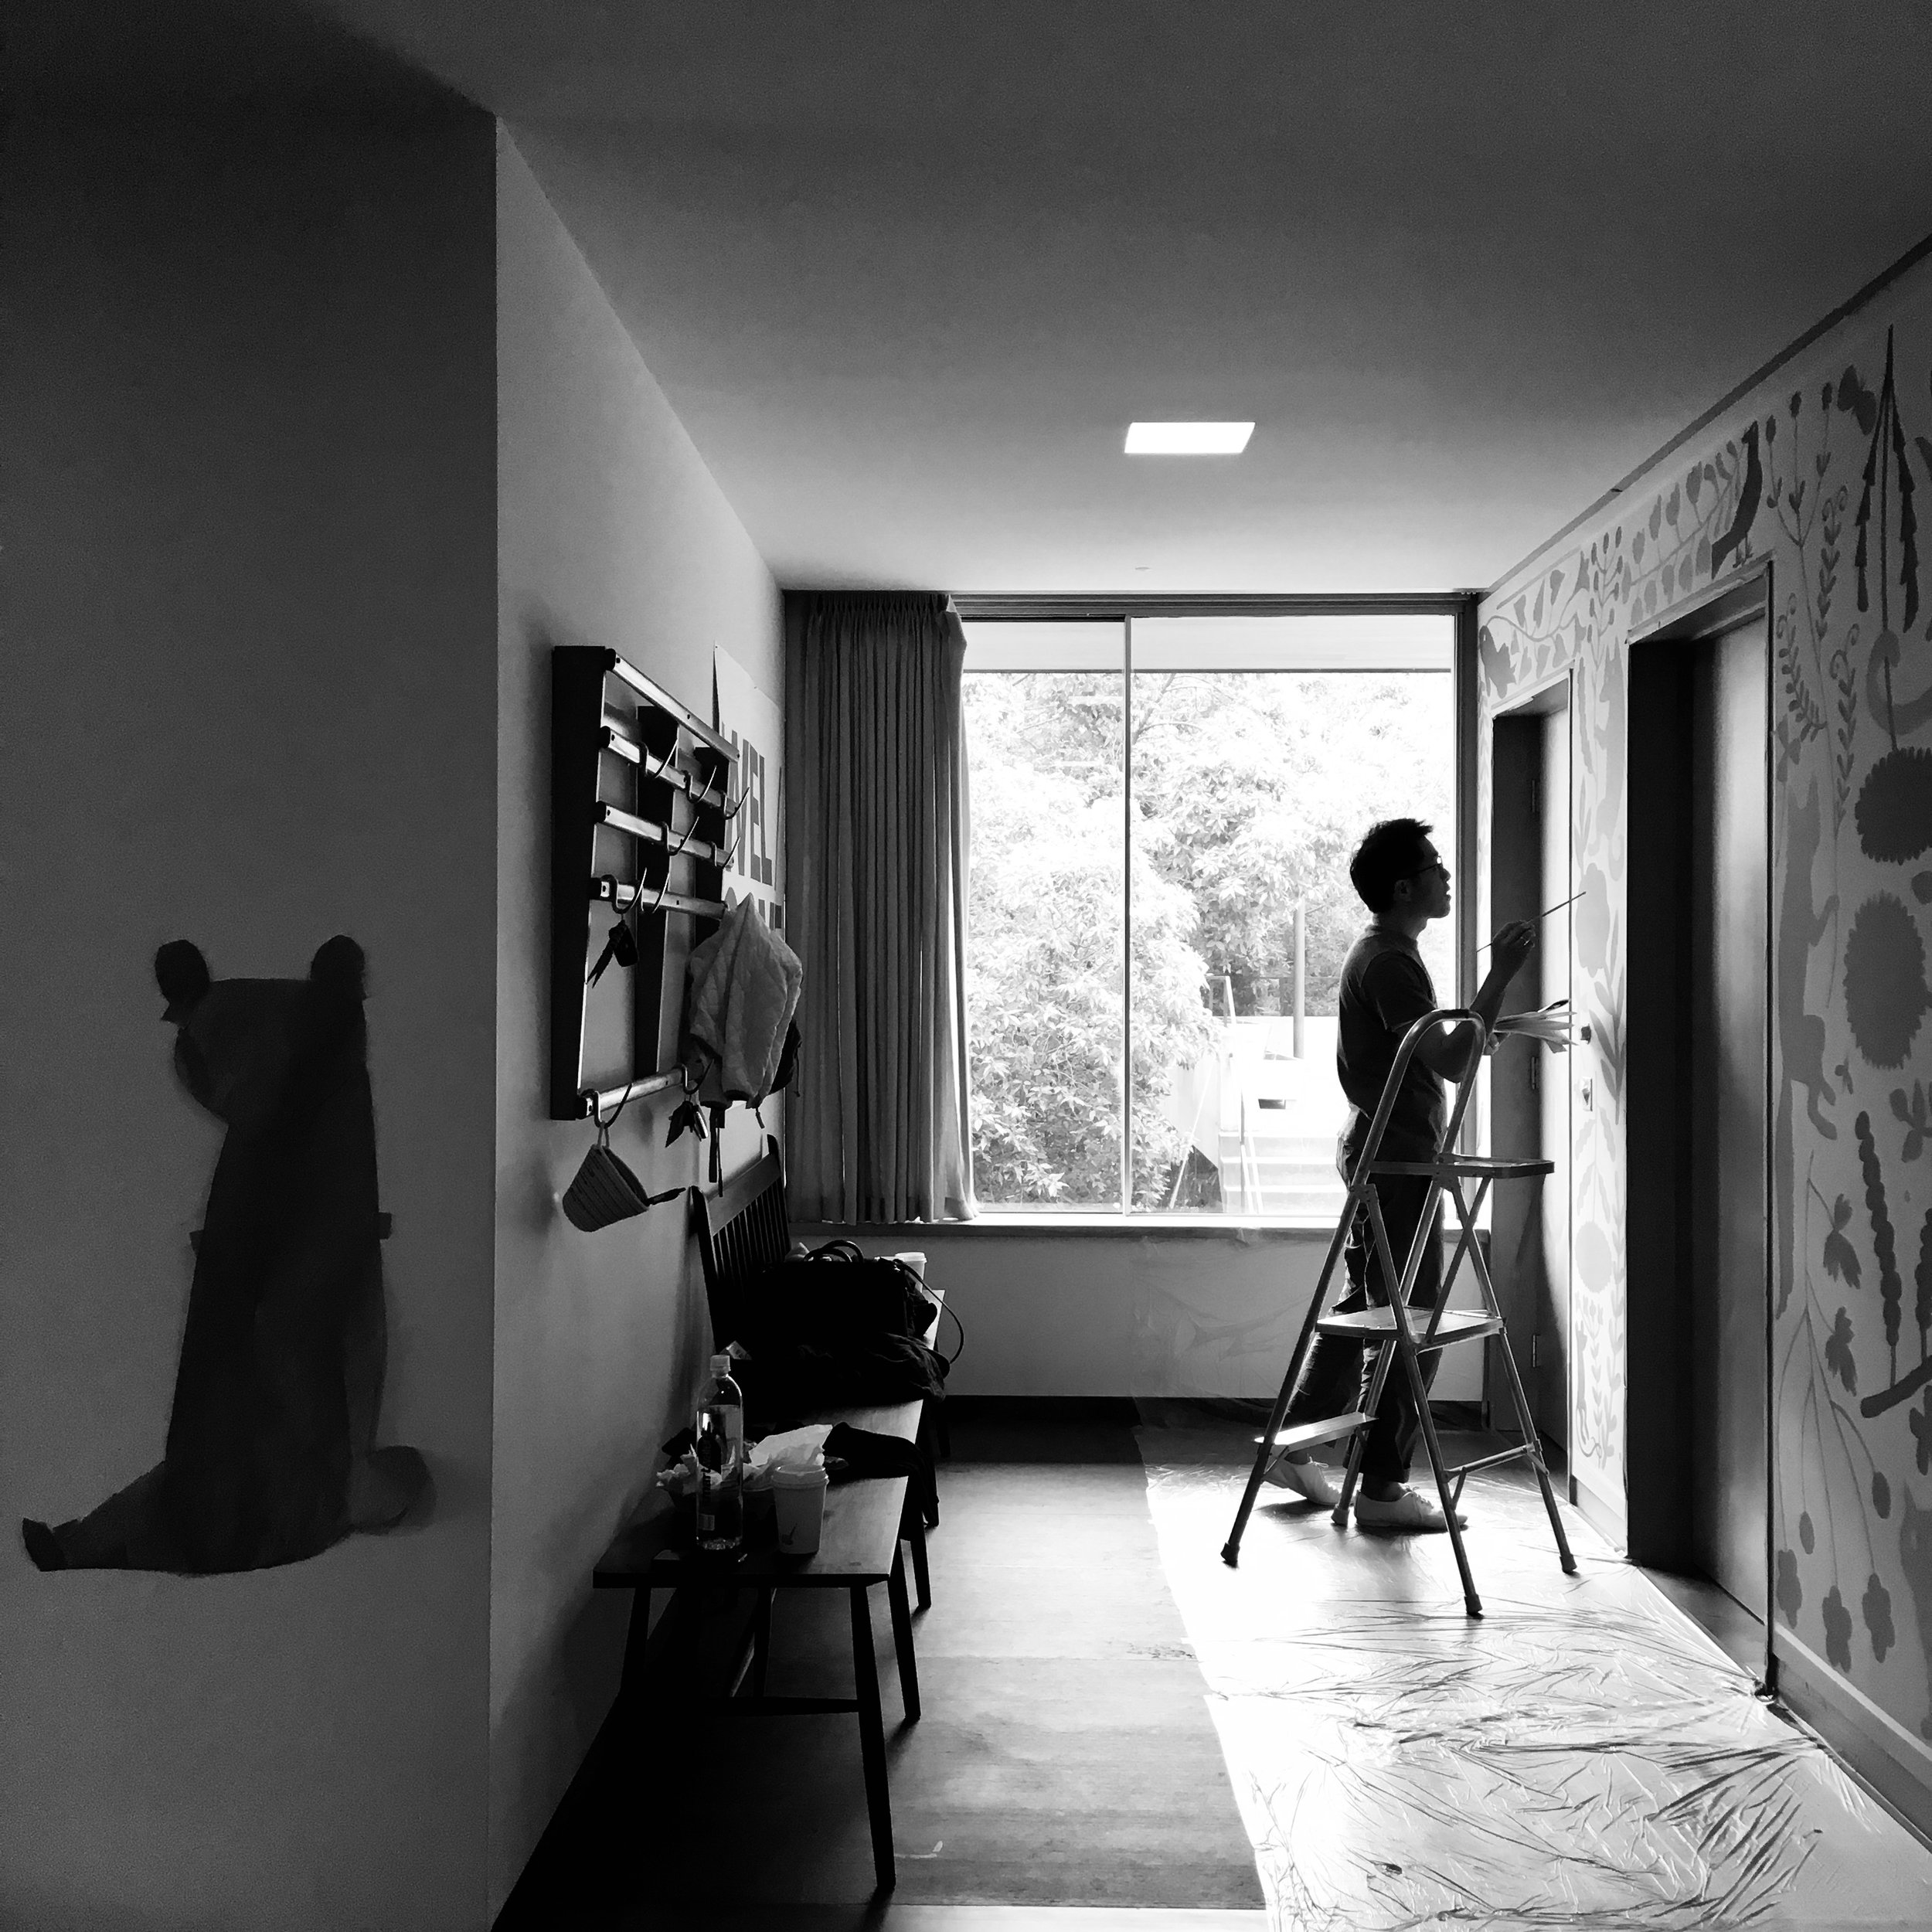 Private Residence, San Francisco, California. Photo by Ritsuko Yagi